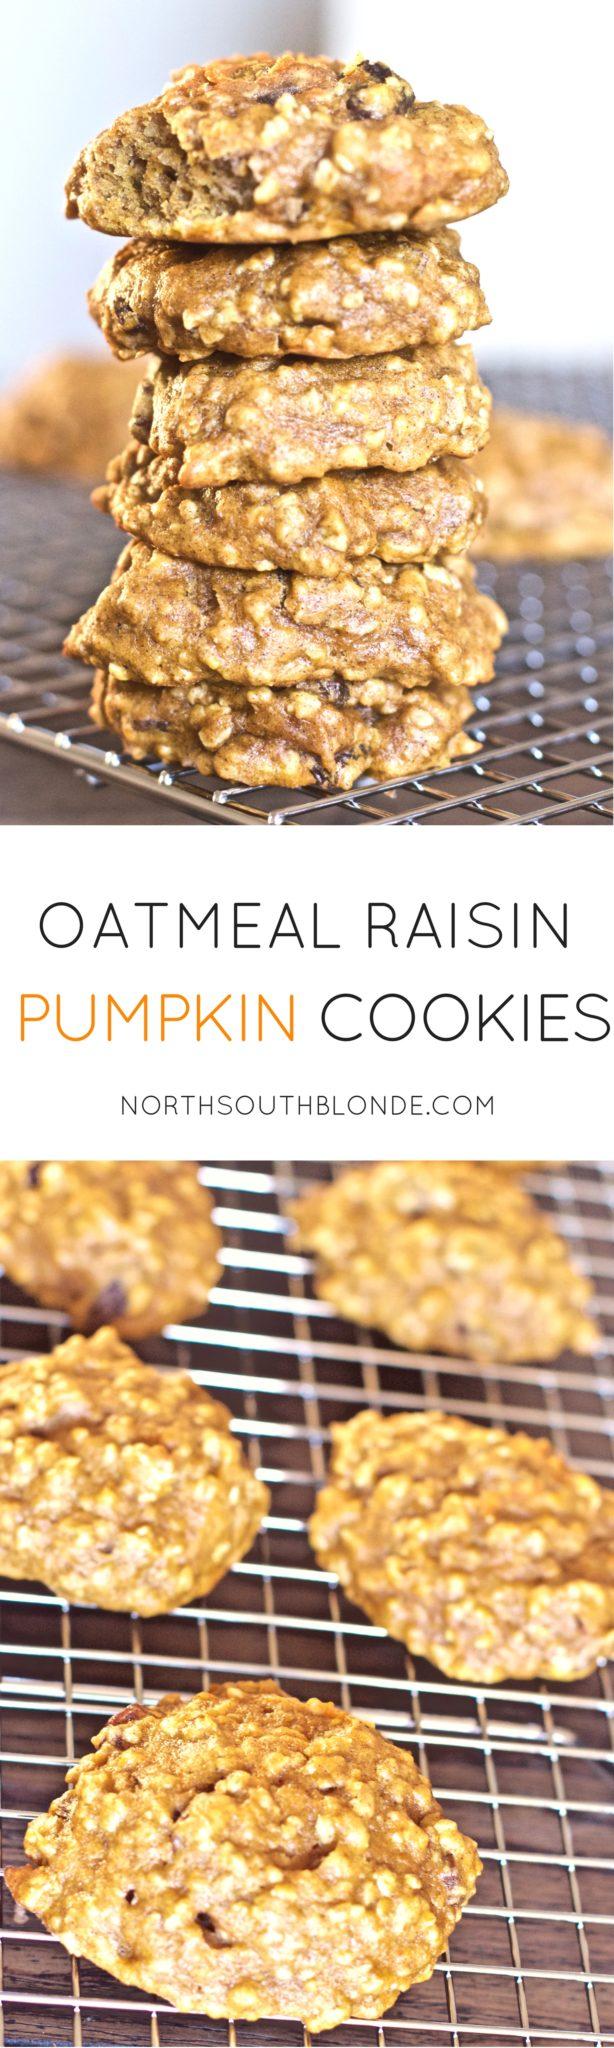 Oatmeal Raisin Pumpkin Cookies (Gluten-Free, Paleo, & Toddler Friendly)